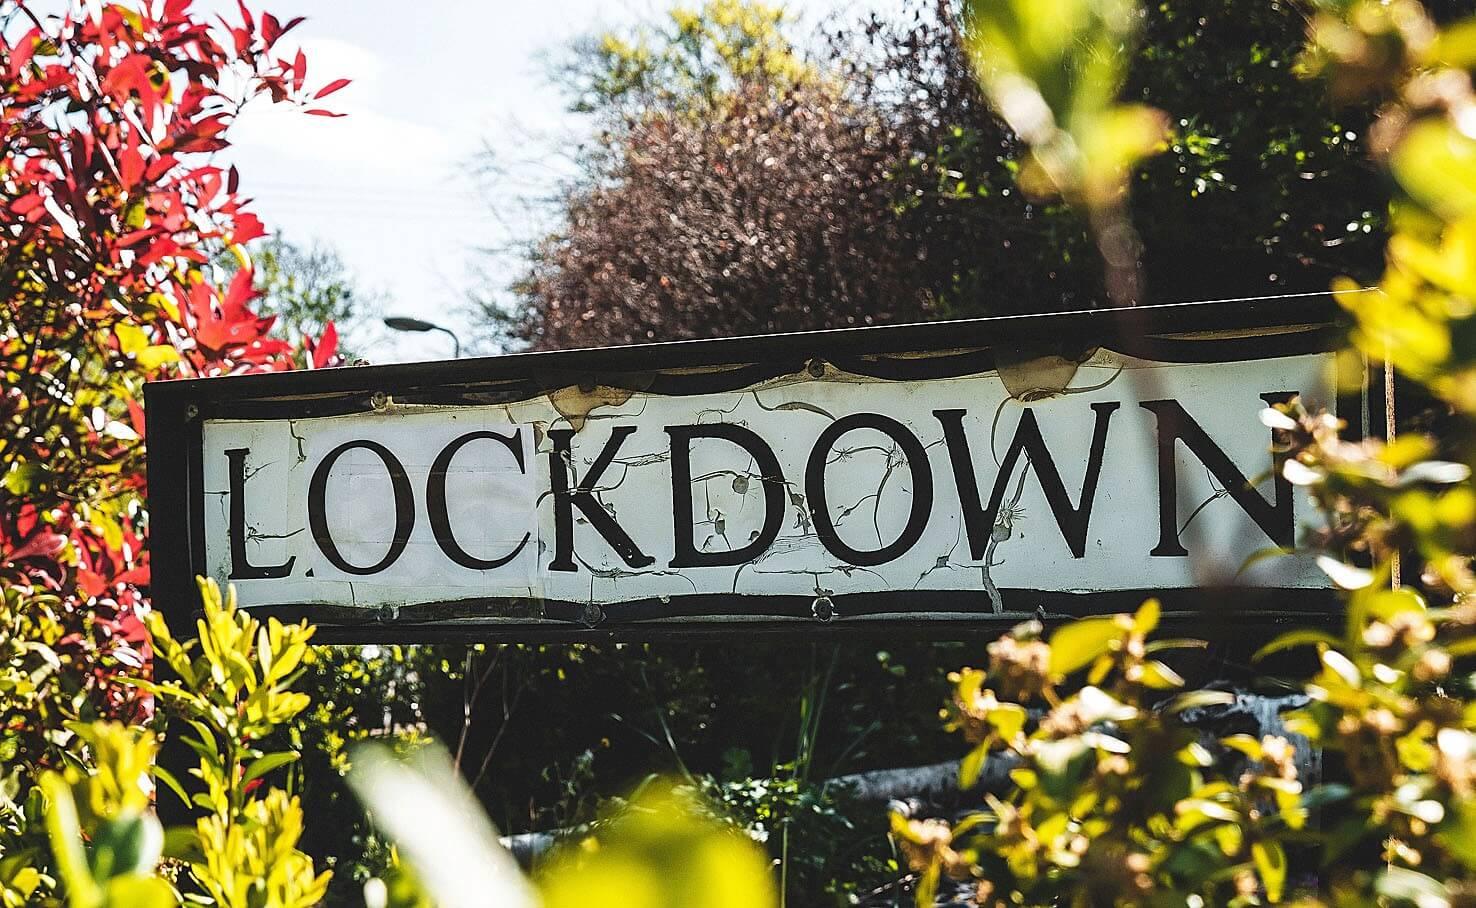 Lockdown figures:  Production on the floor, packaging in progress